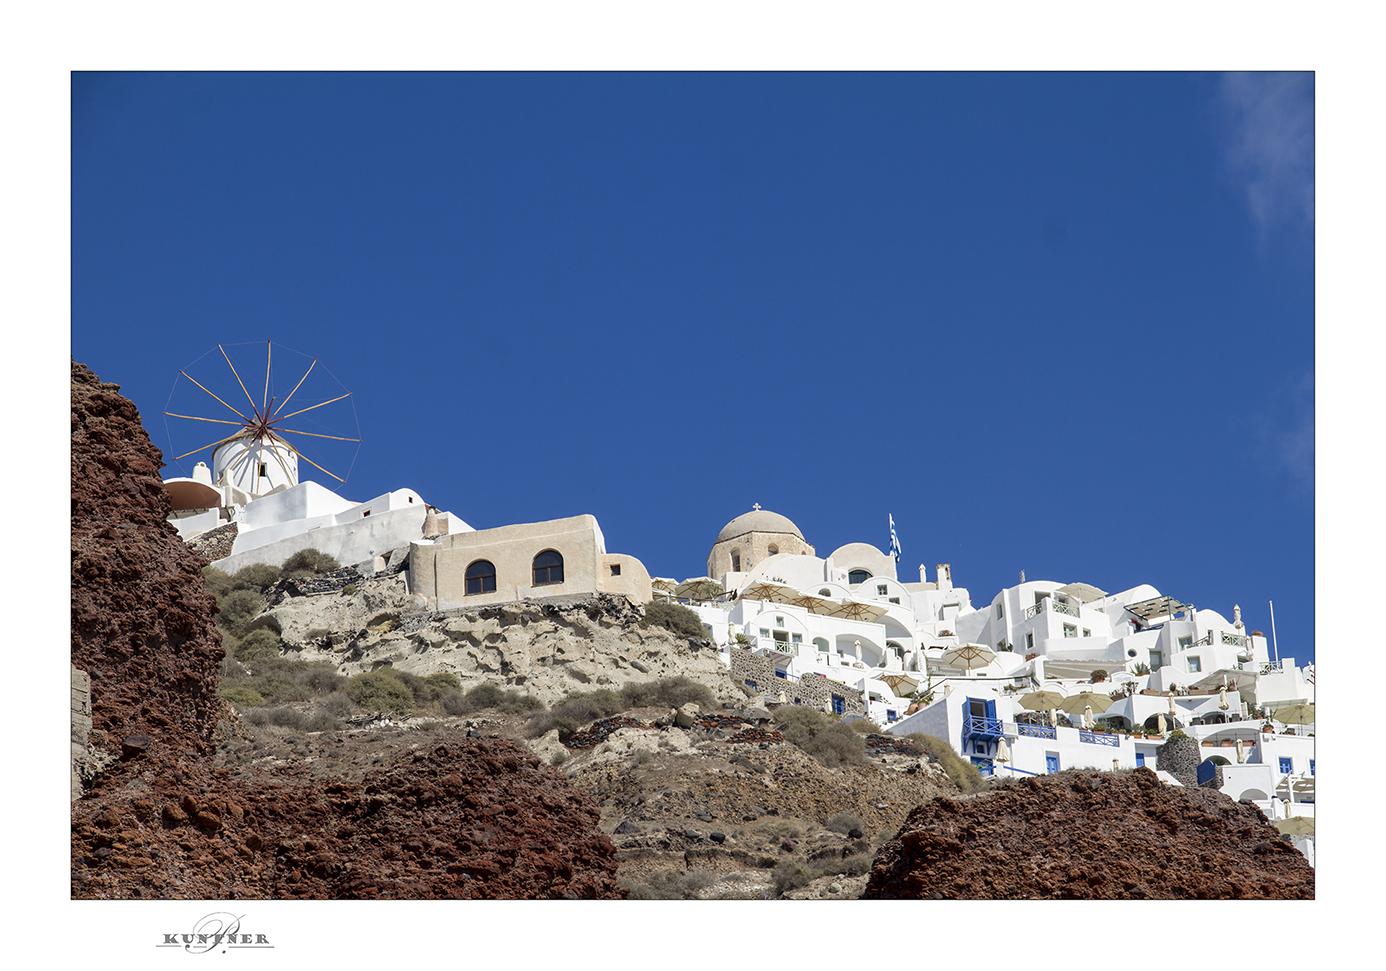 Die Stadt auf dem Vulkan Santorin